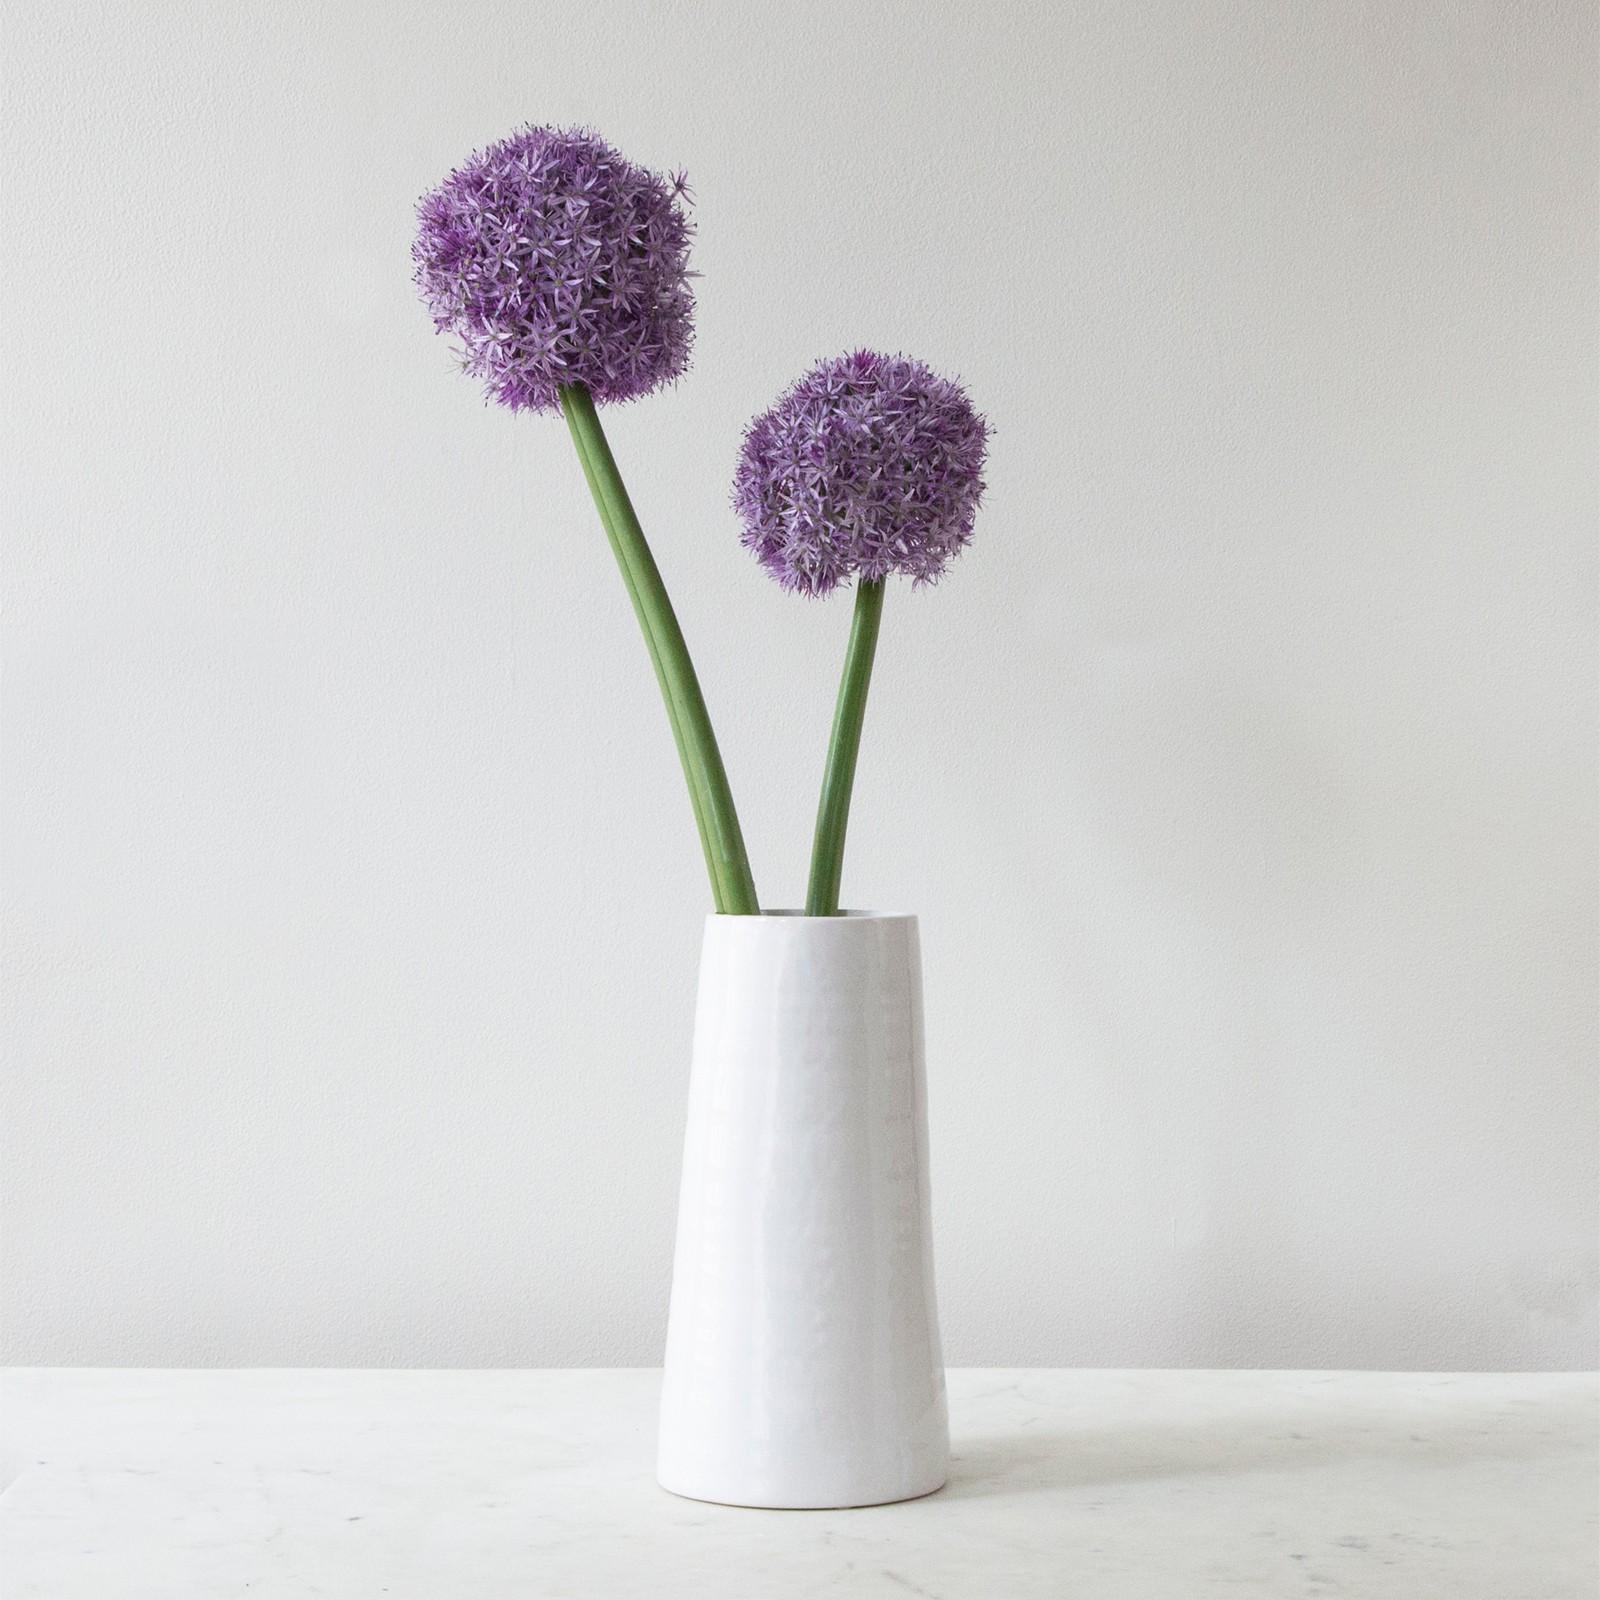 Vases zola reviewsmspy